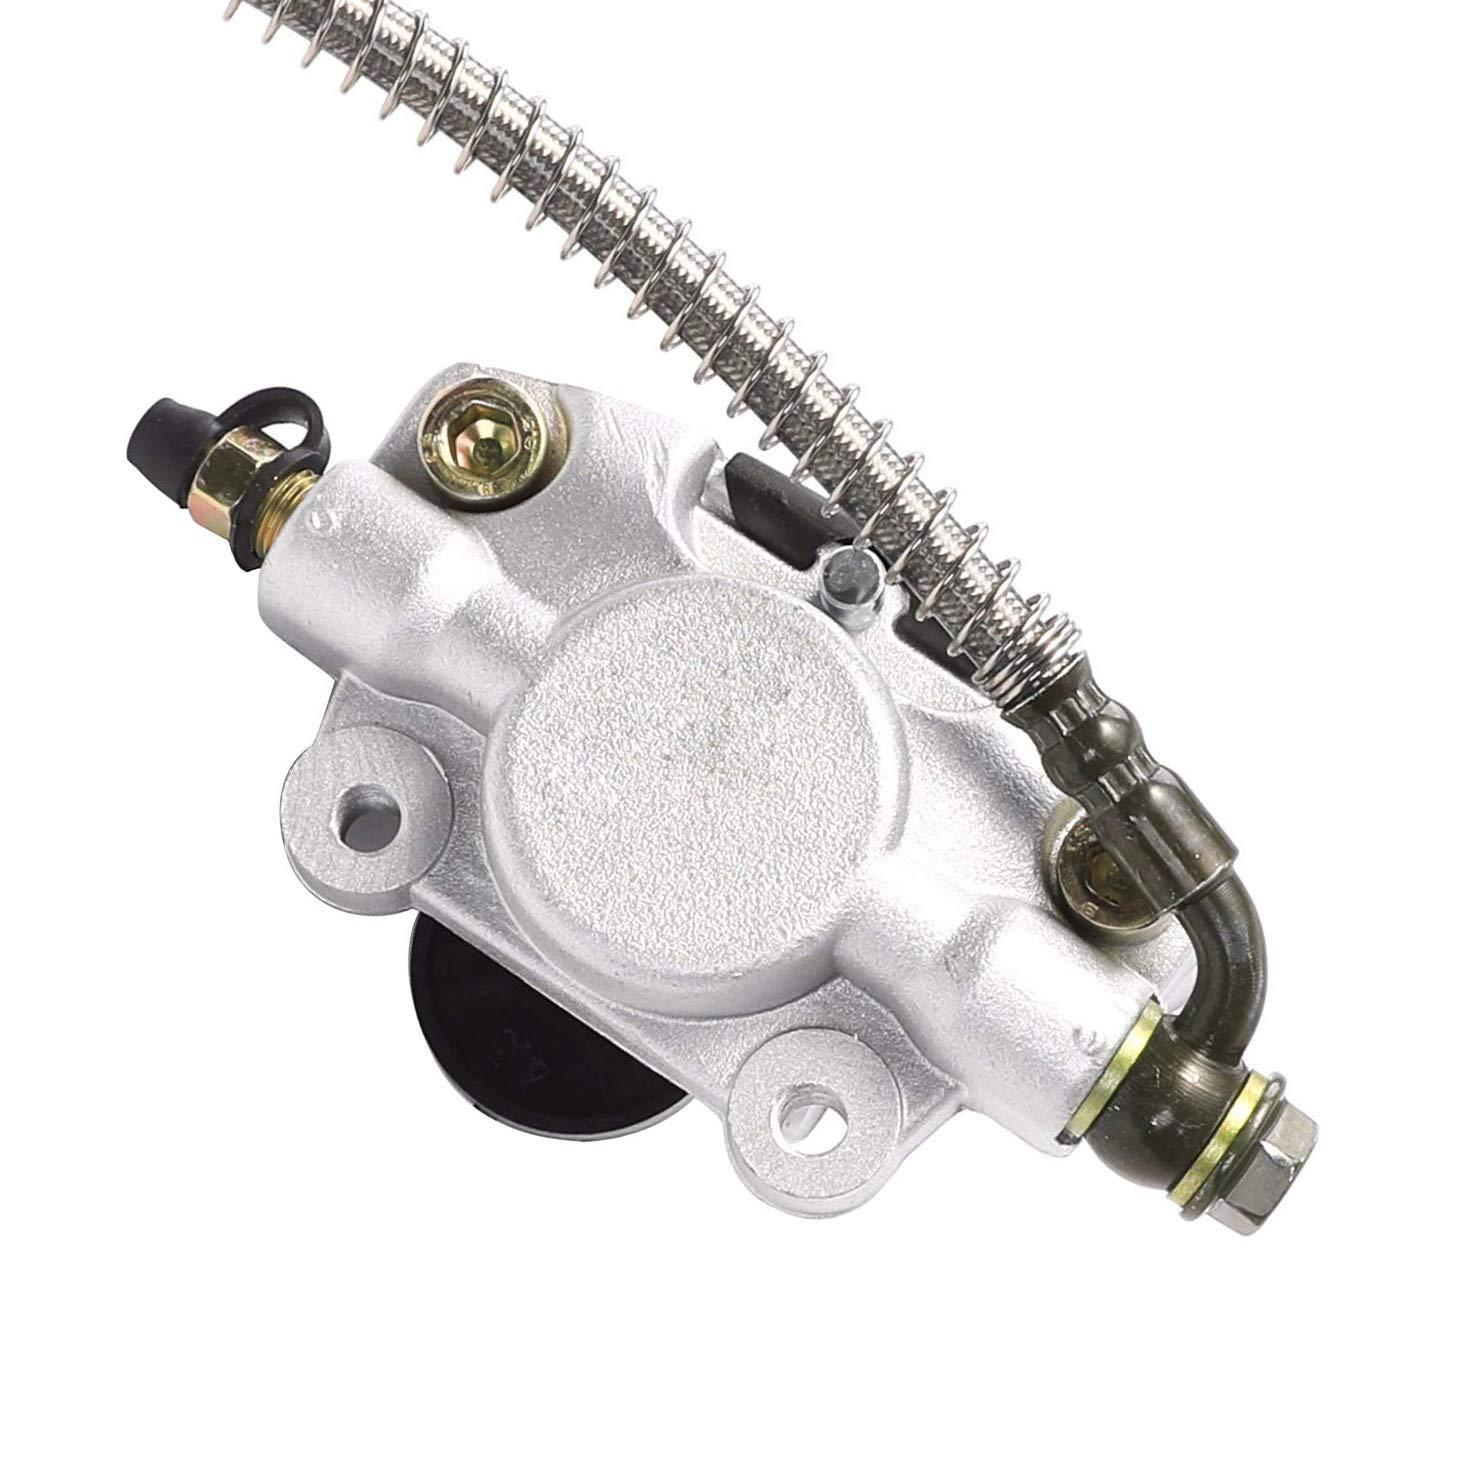 Roketa Rear disc brake assembly master cylinder caliper For ATV Quad 150cc 200 250cc Taotao Buyang Kazuma AIM-EX Coolsport Sunl